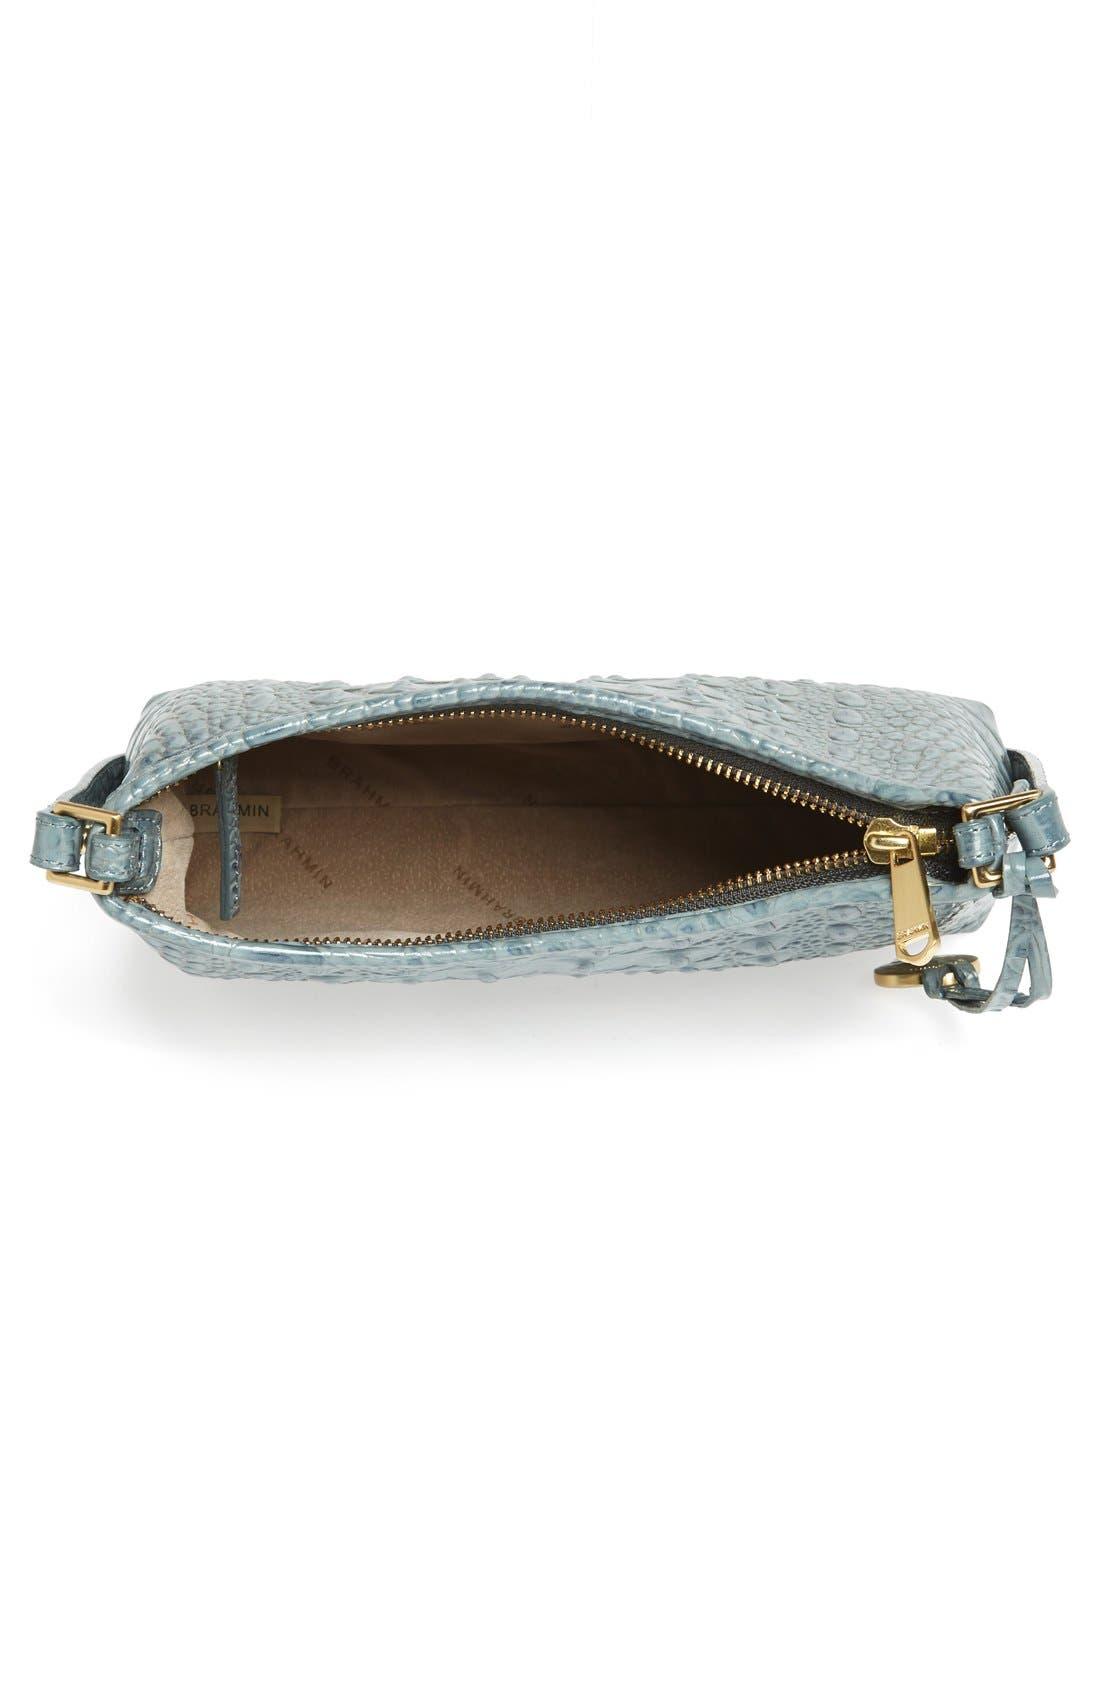 'Anytime - Mini' Convertible Handbag,                             Alternate thumbnail 51, color,